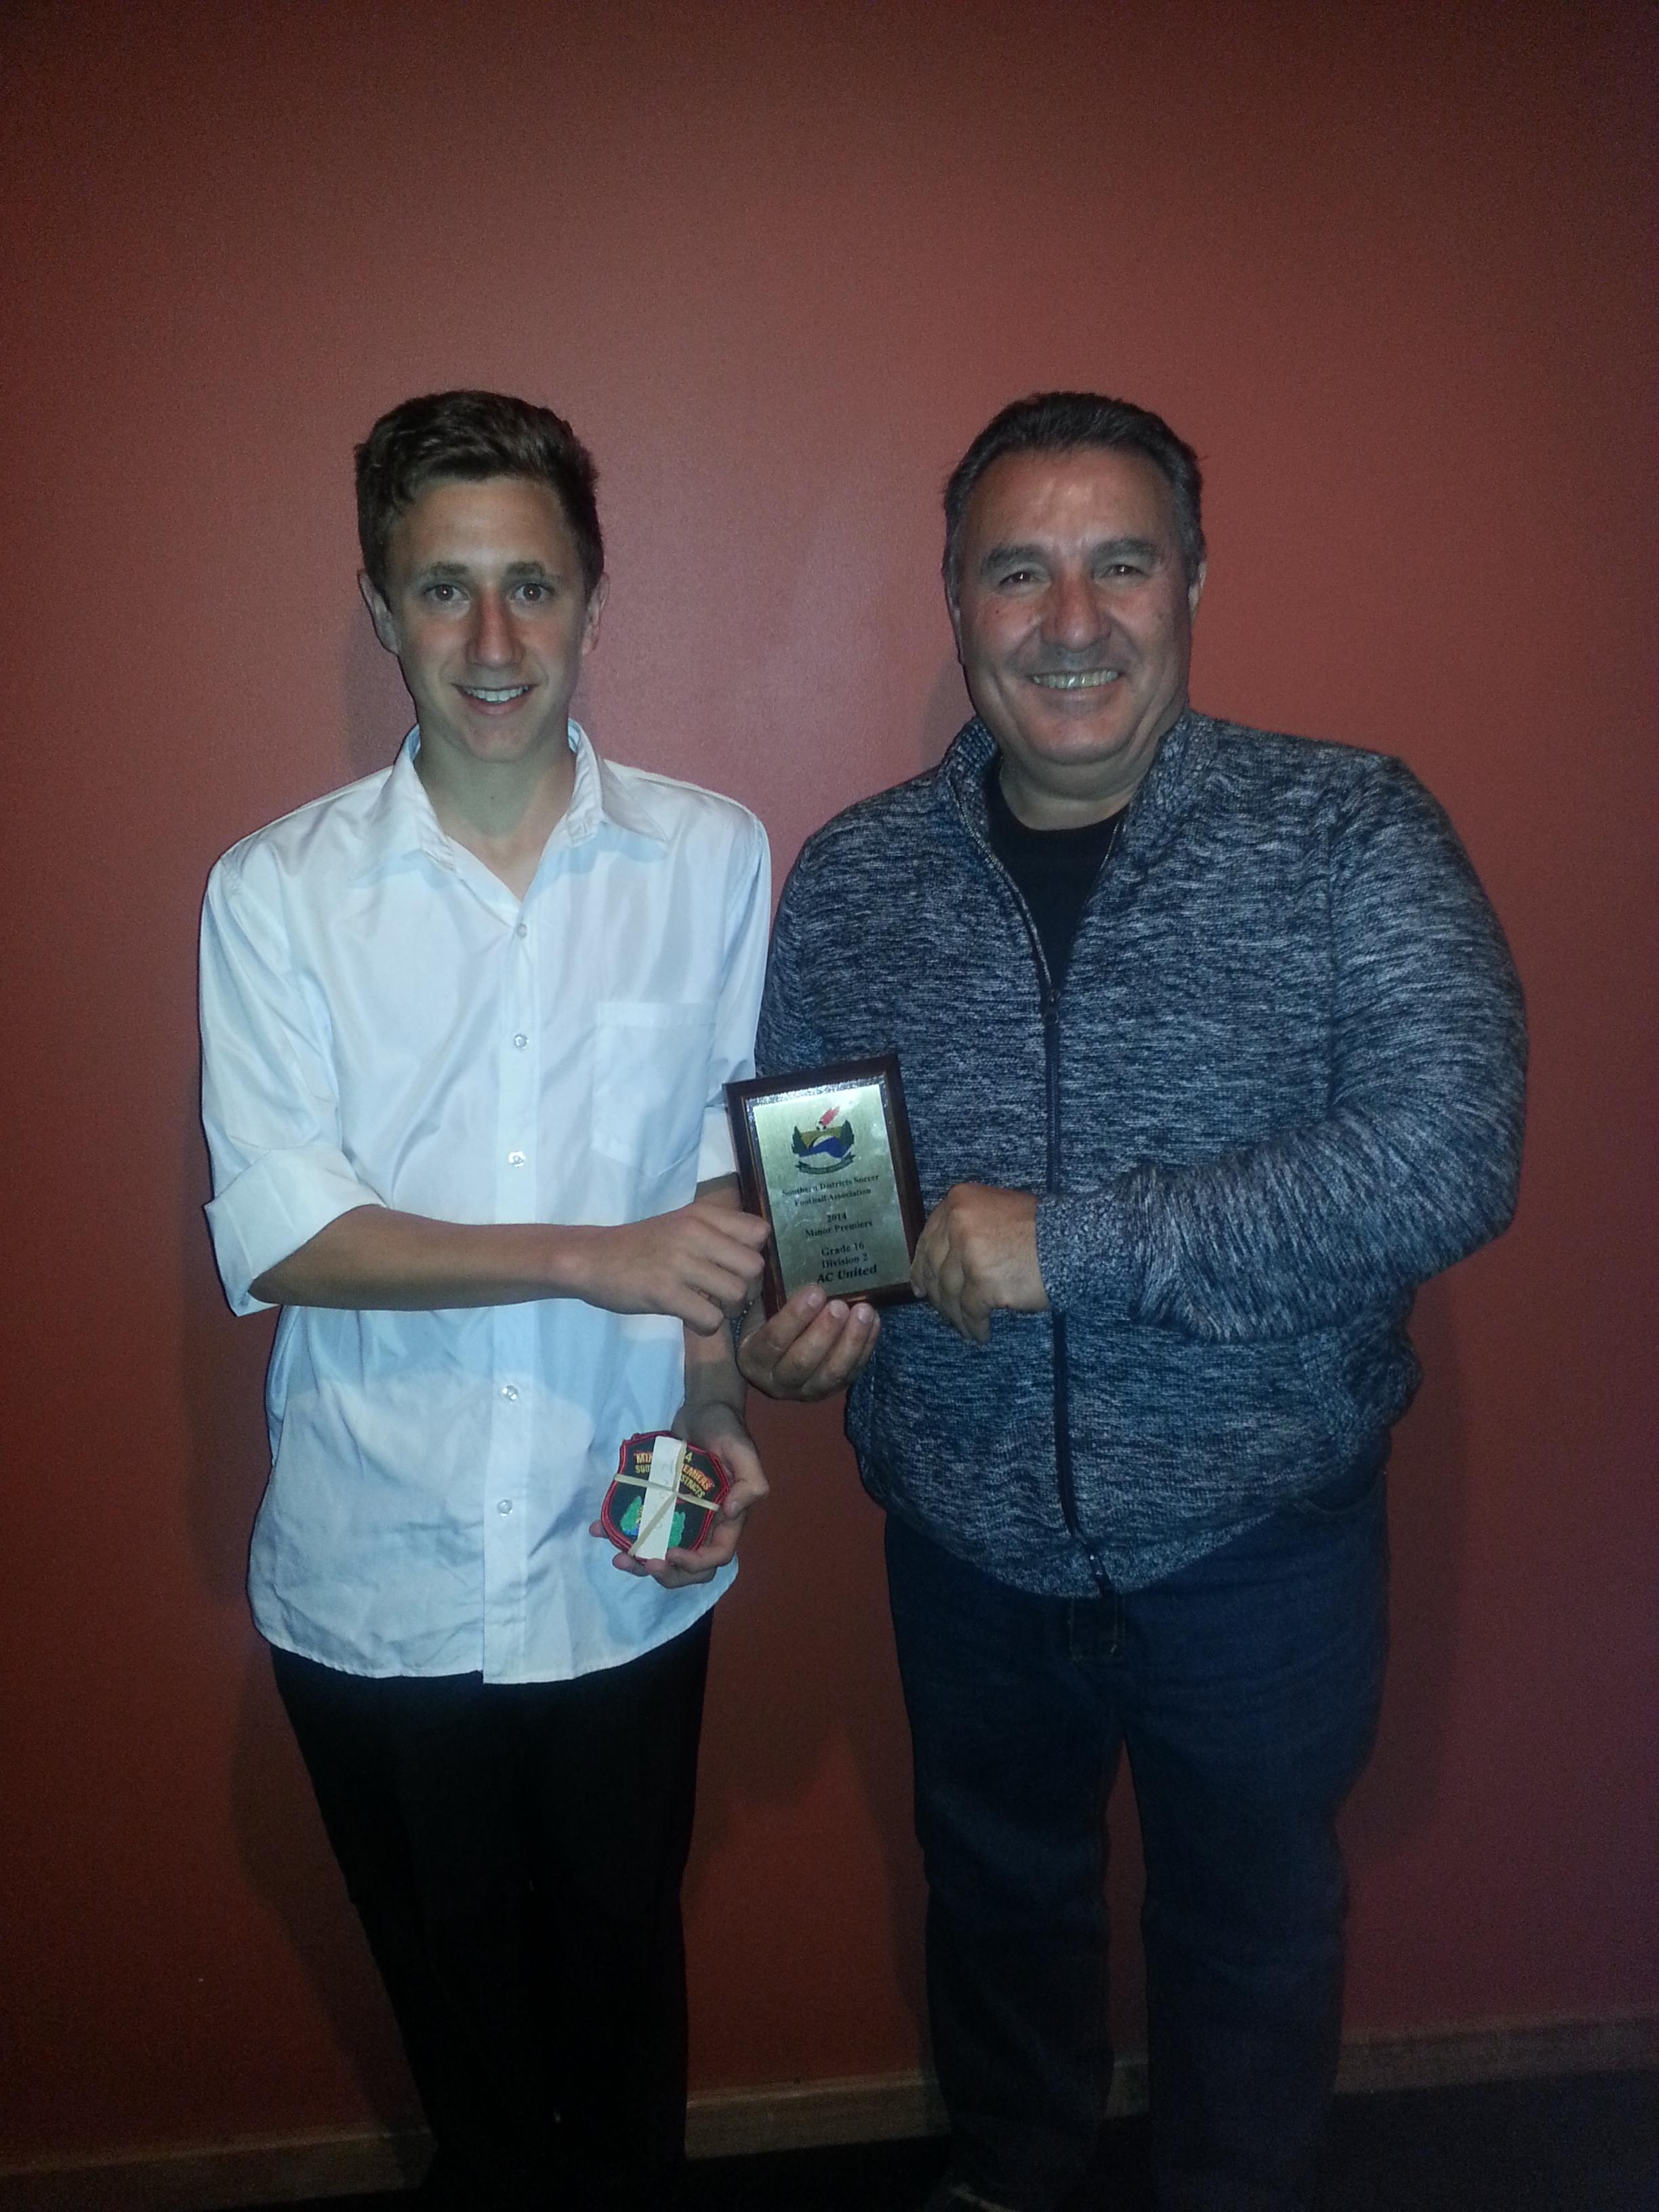 Jack_and_Joe_U16_Div2_winners.jpg